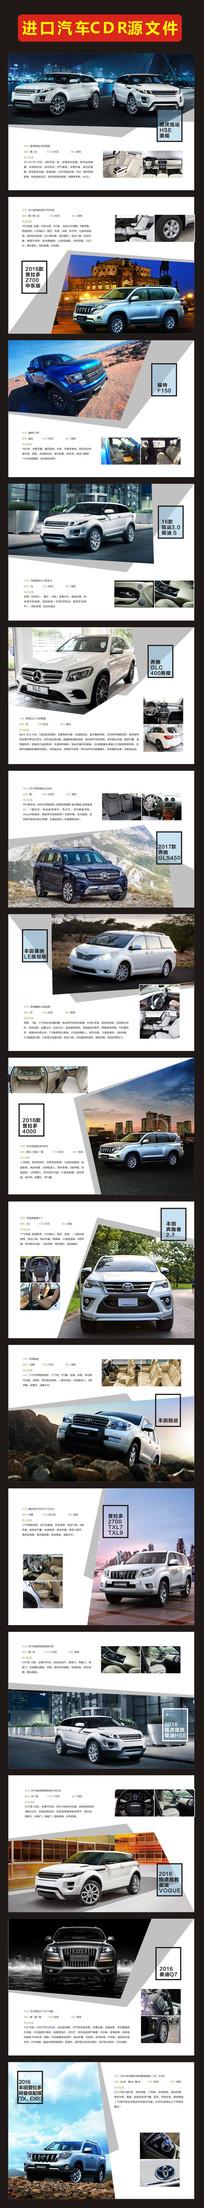 进口汽车画册cdr源文件